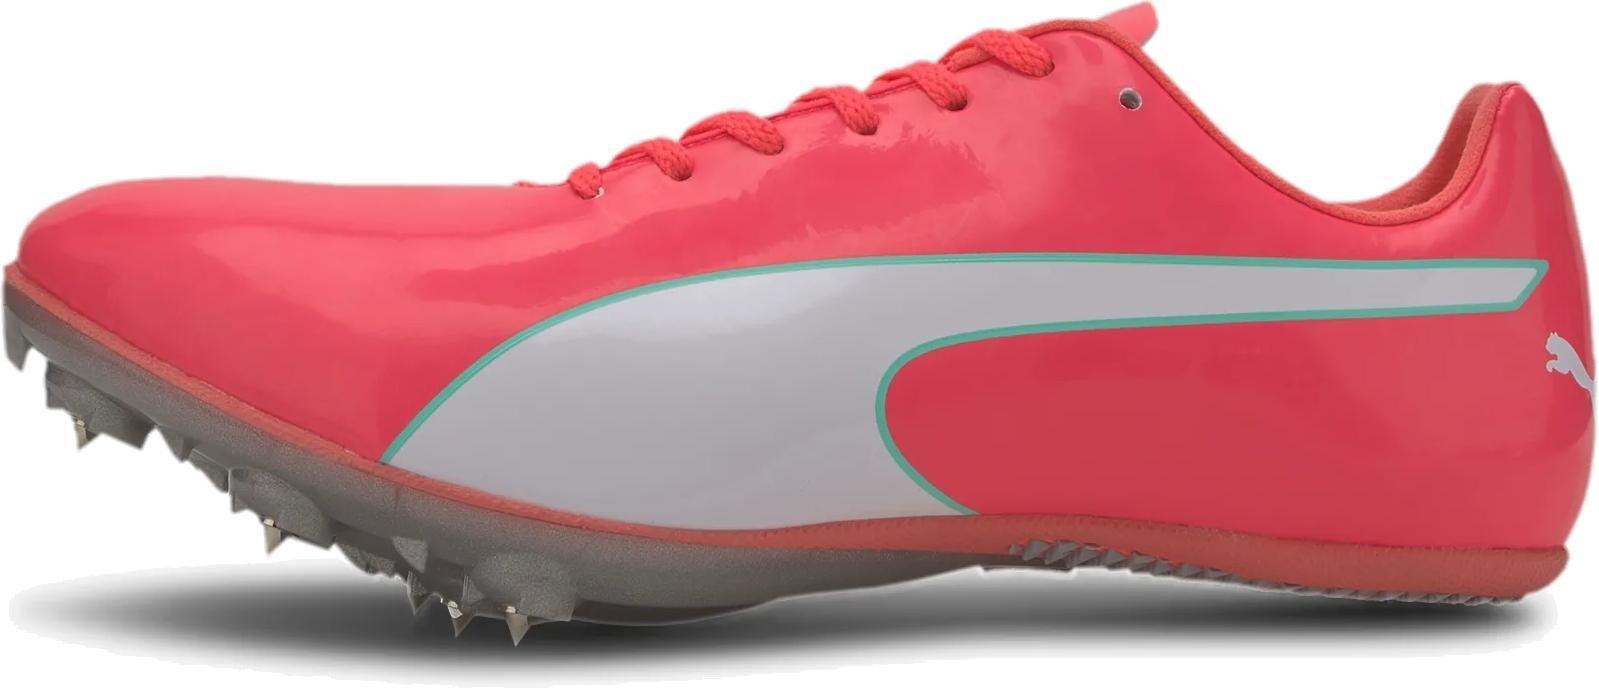 Track shoes/Spikes Puma EVOSPEED SPRINT